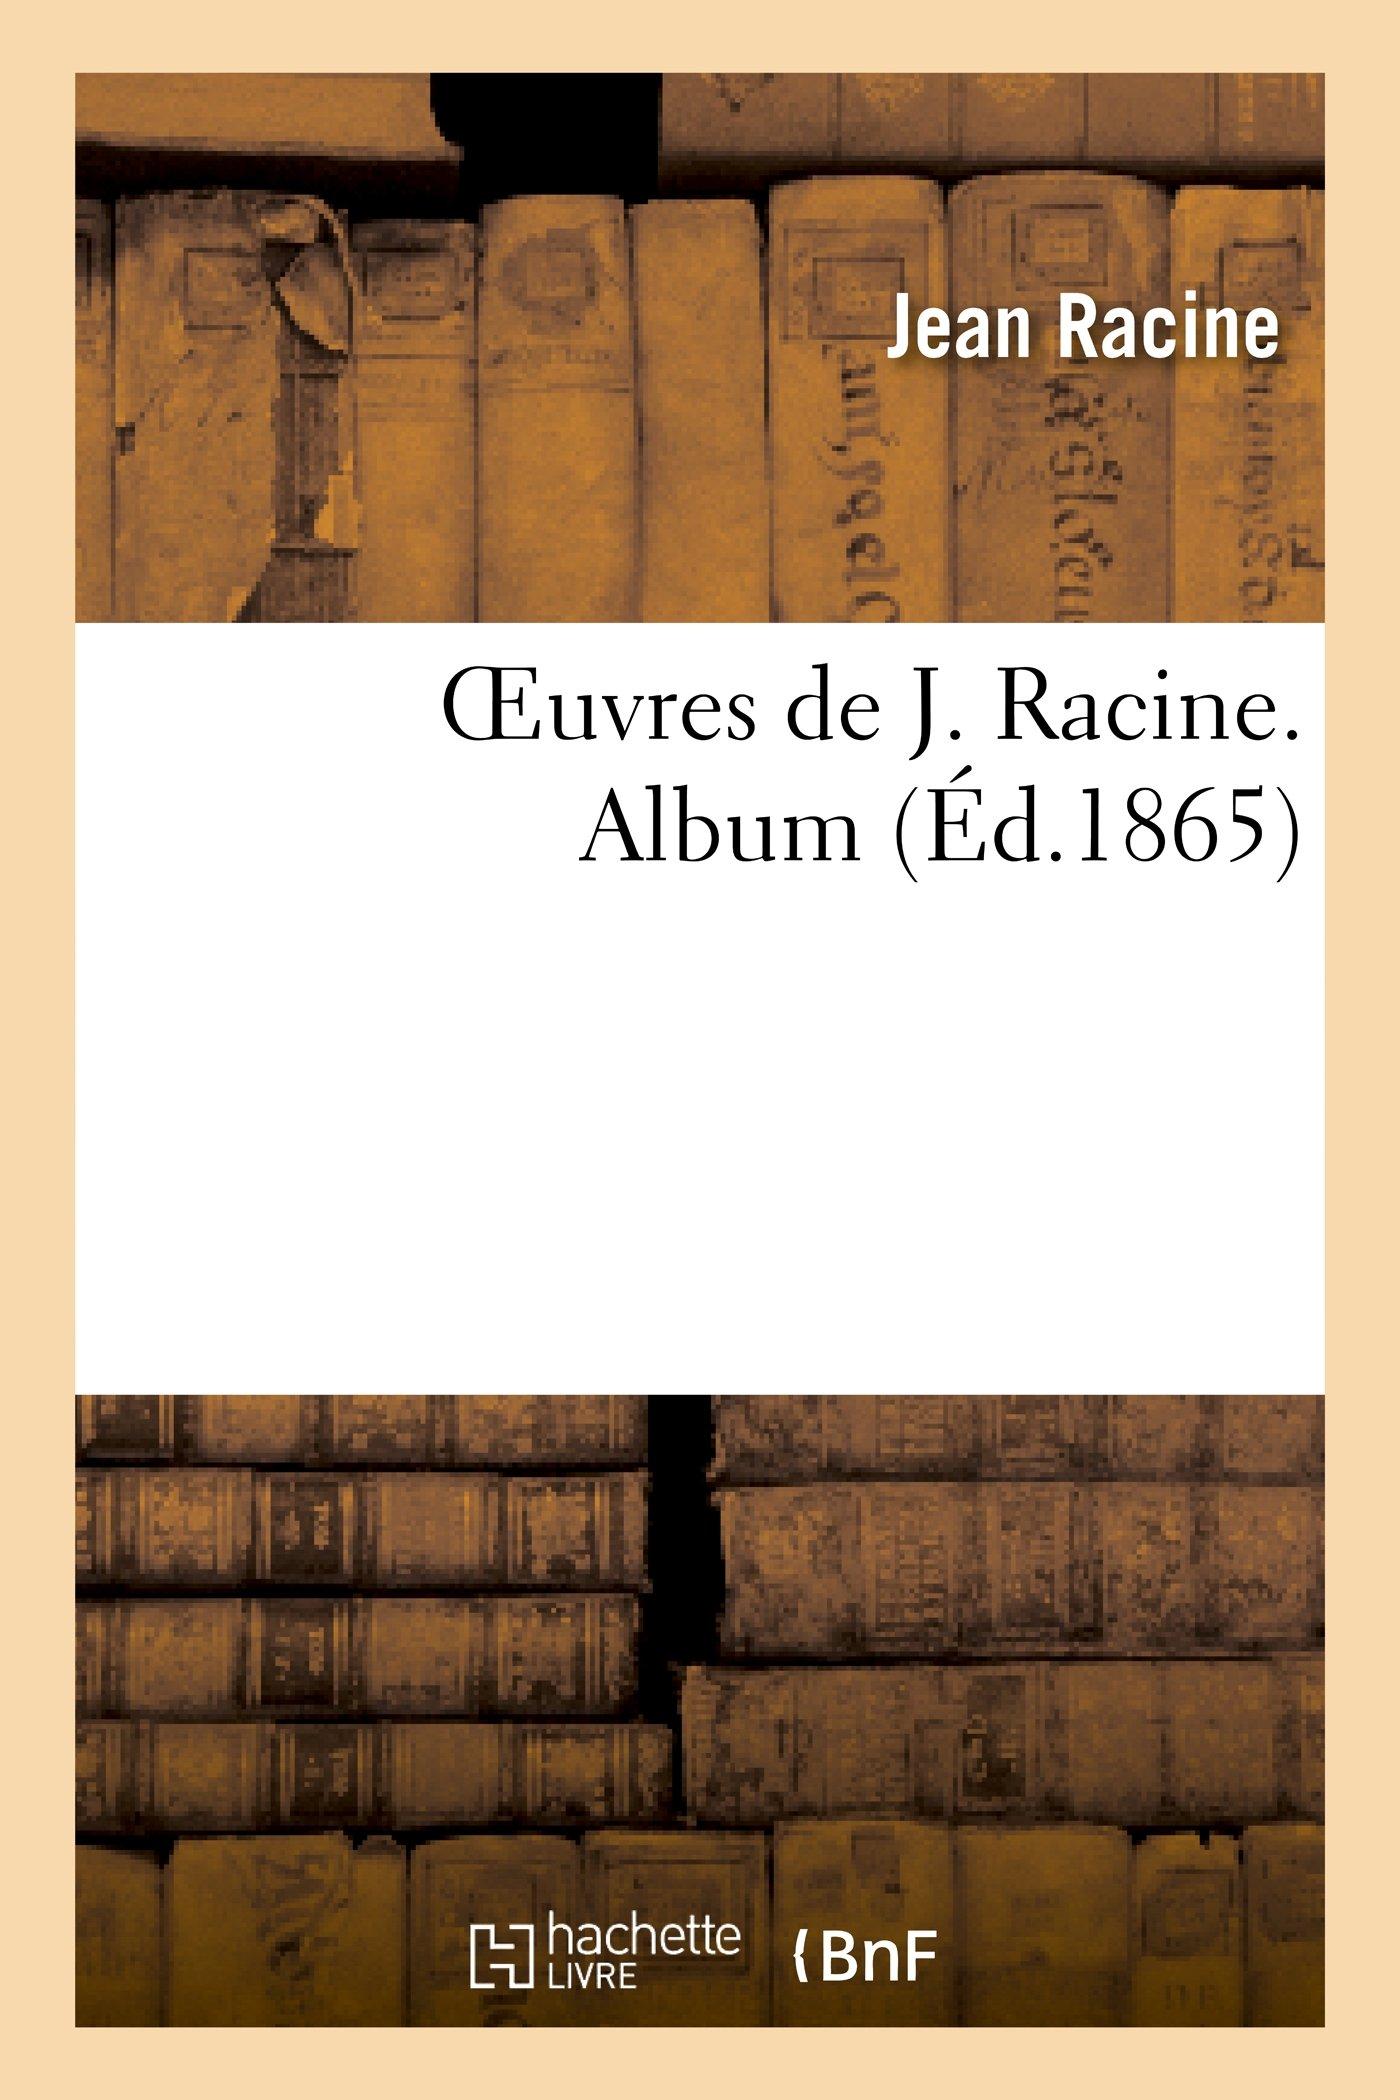 Oeuvres de J. Racine. Album Broché – 1 avril 2013 Jean Racine Hachette Livre BNF 2012169716 France